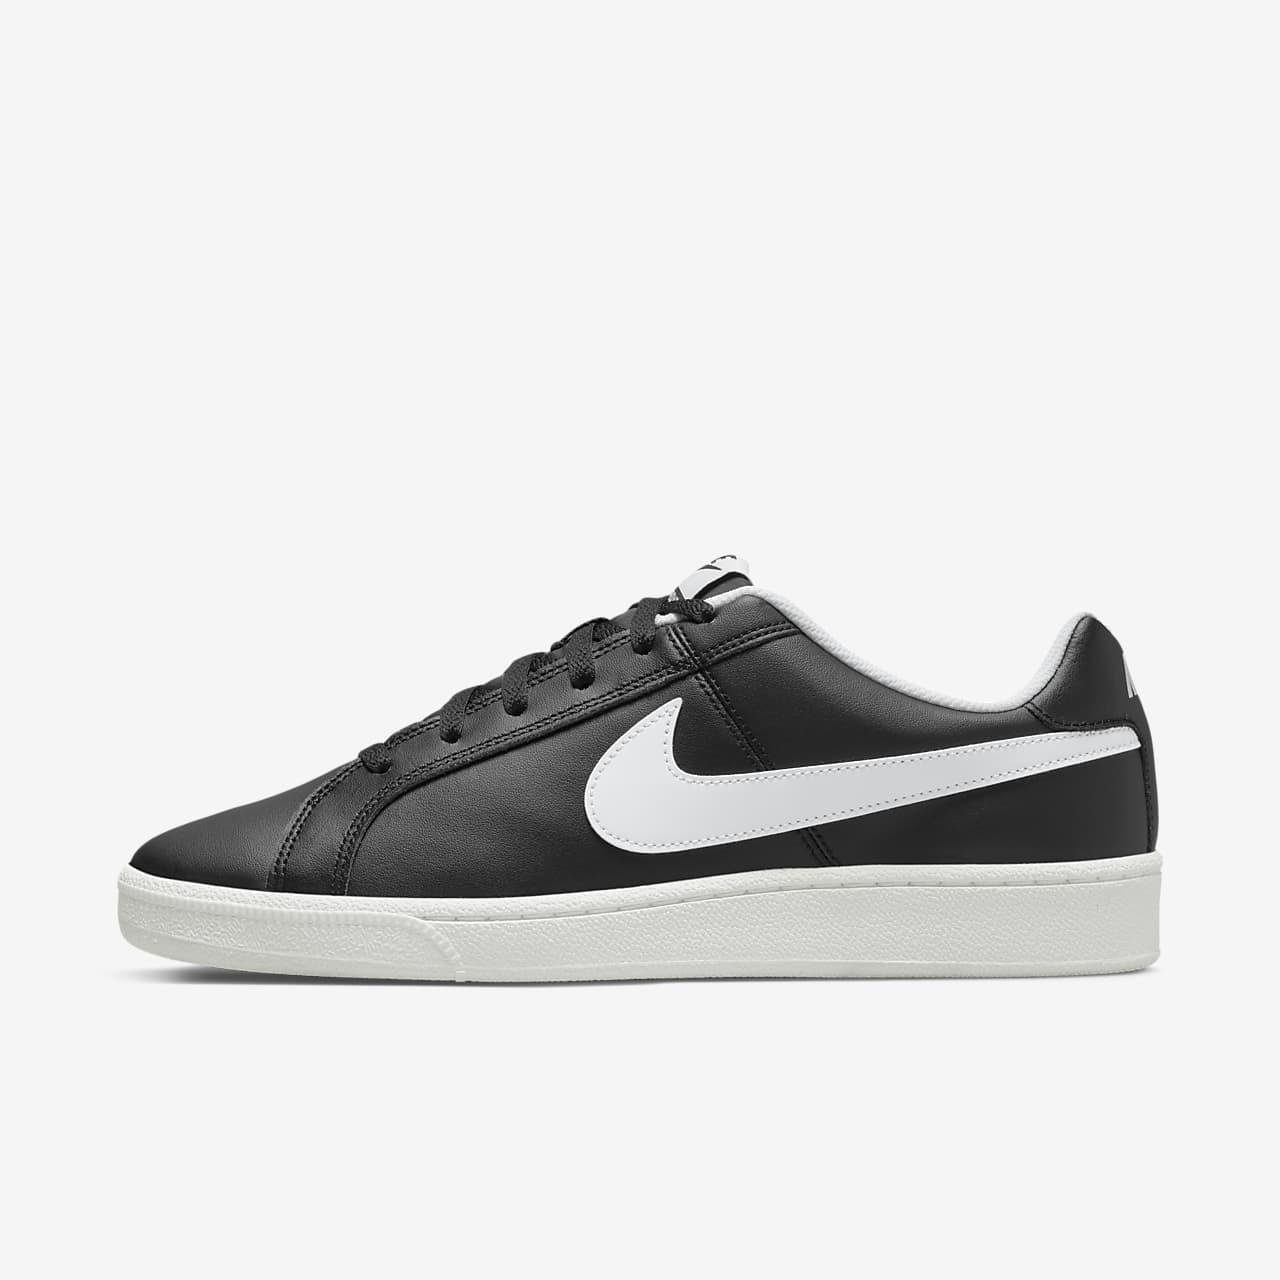 NikeCourt Royale Men's Shoe. Nike LU